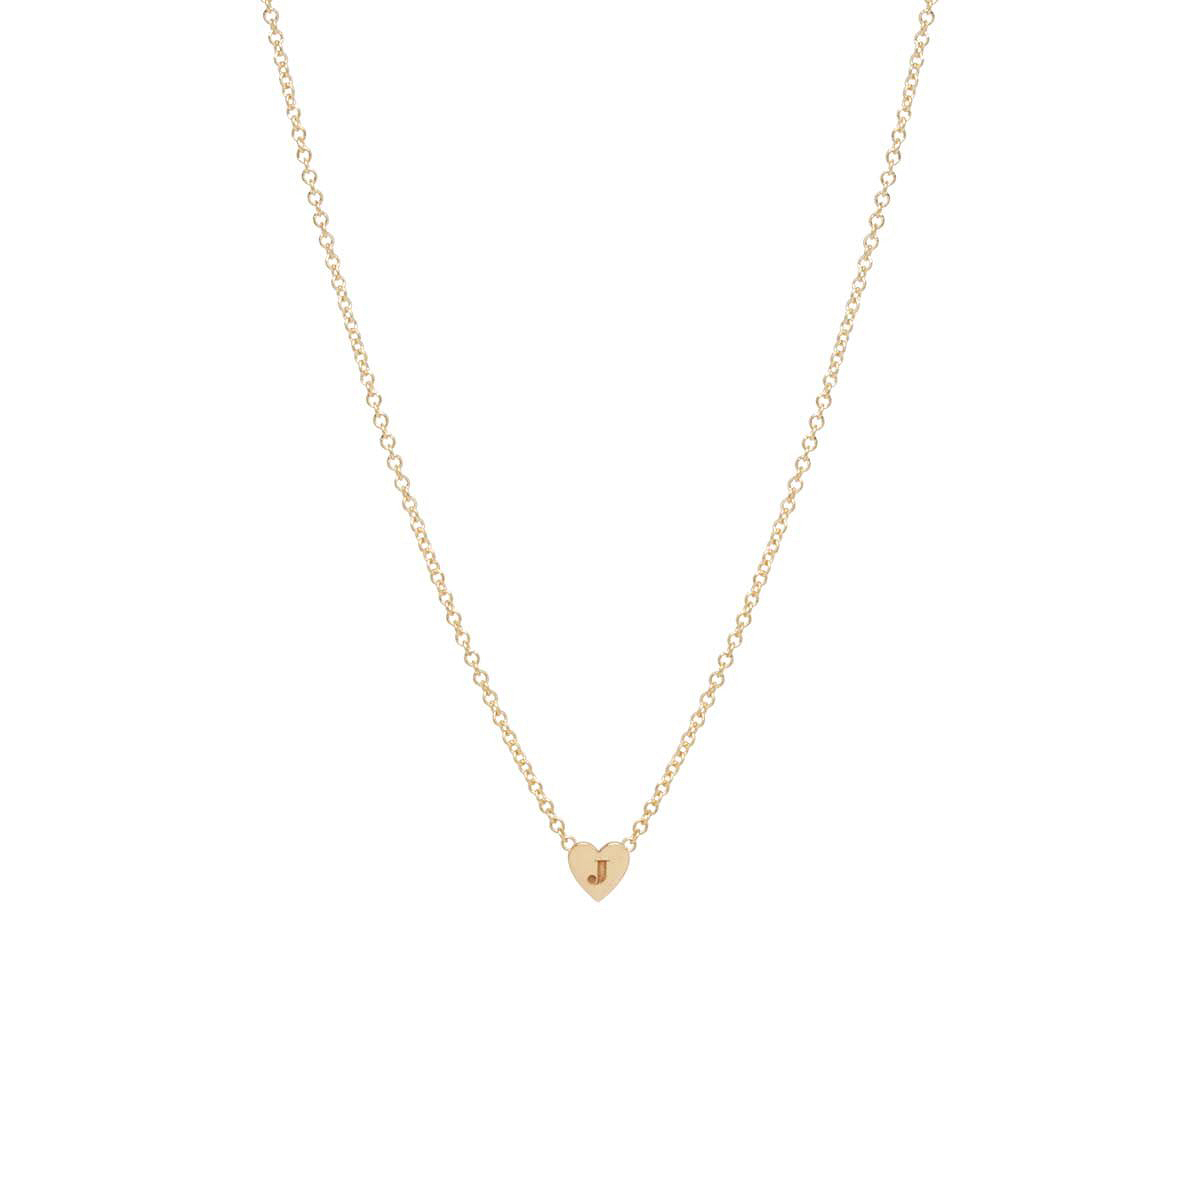 Zoë Chicco Heart Necklace